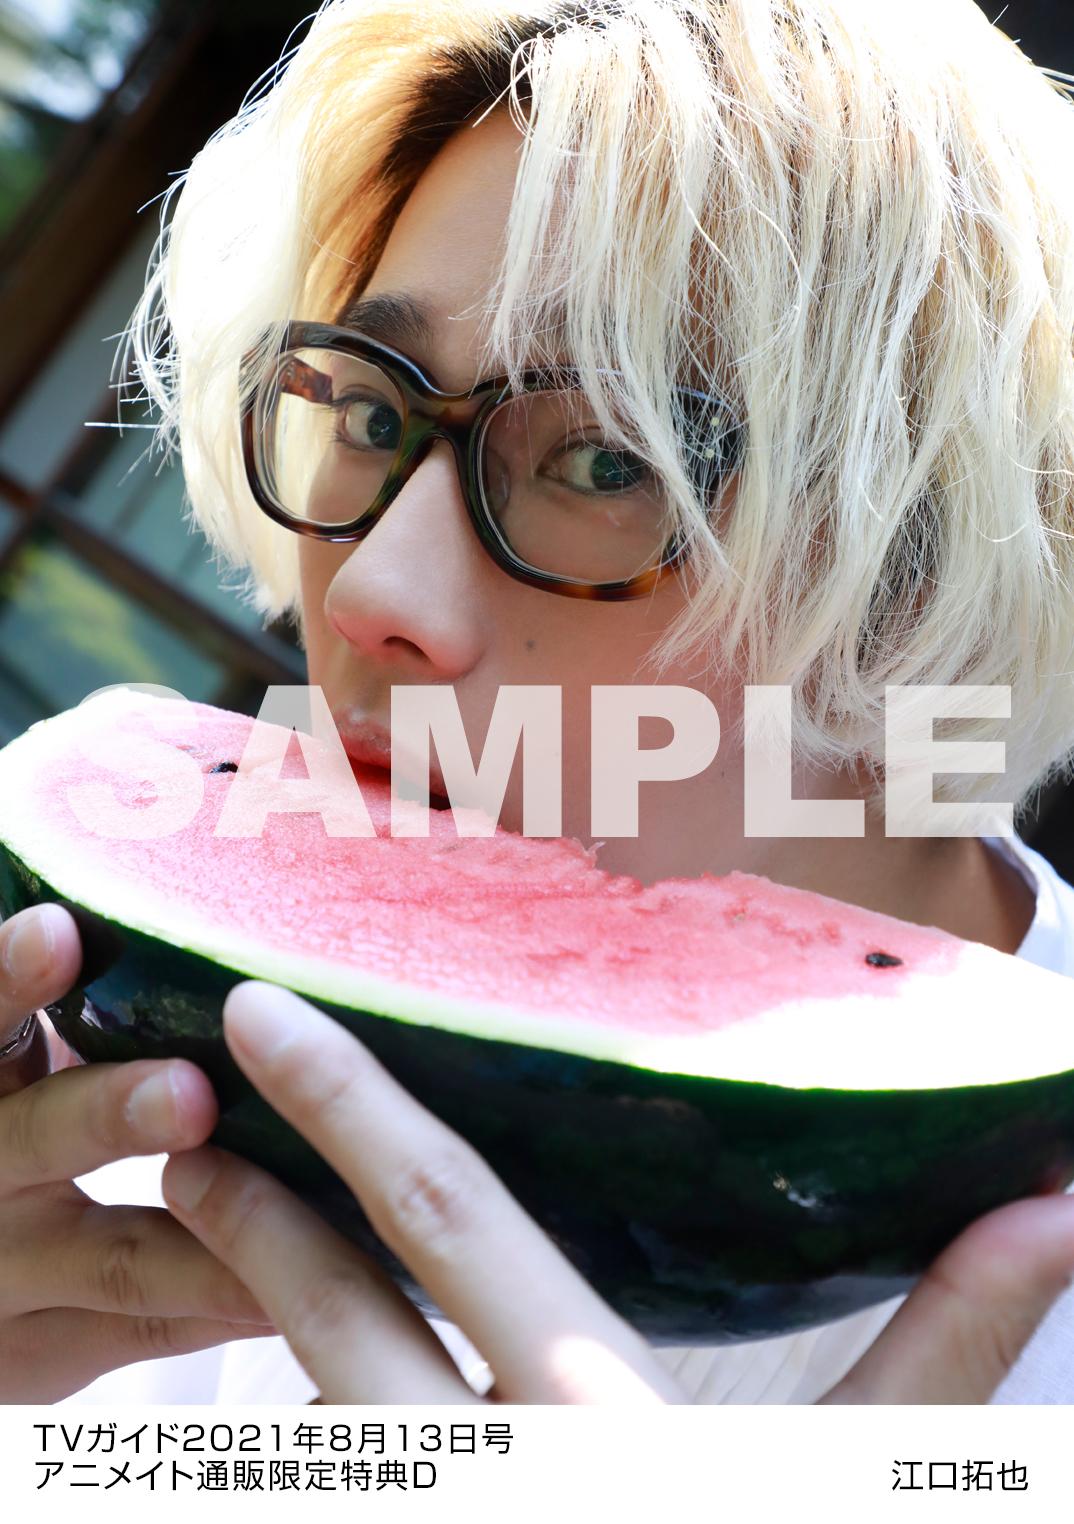 「TVガイド2021年8/13号」江口拓也さん 特典生写真D